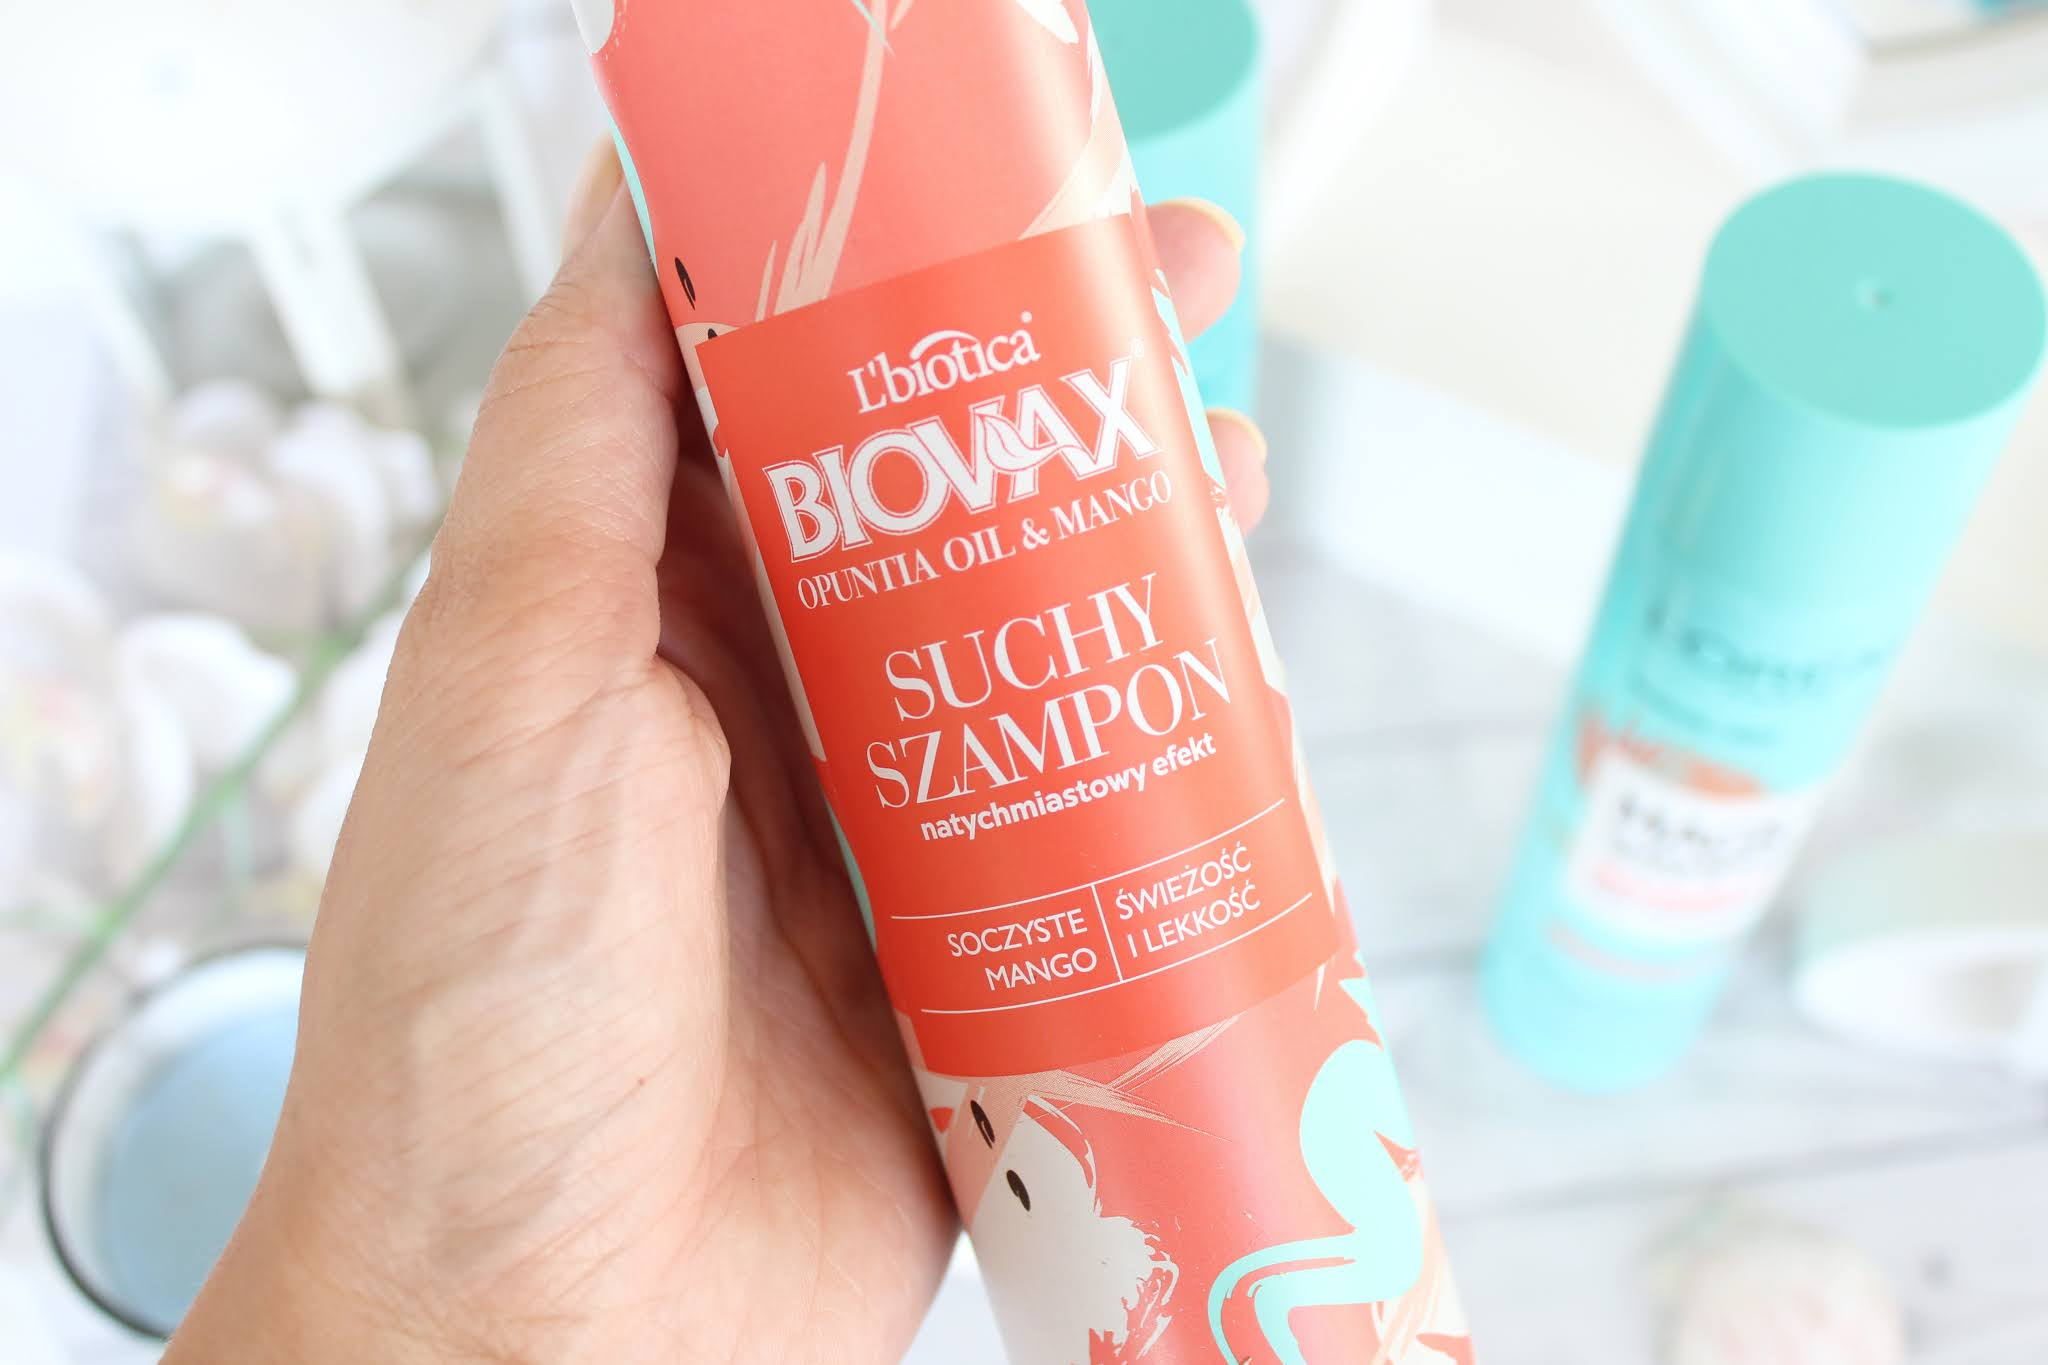 L'biotica Biovax Botanic suchy szampon